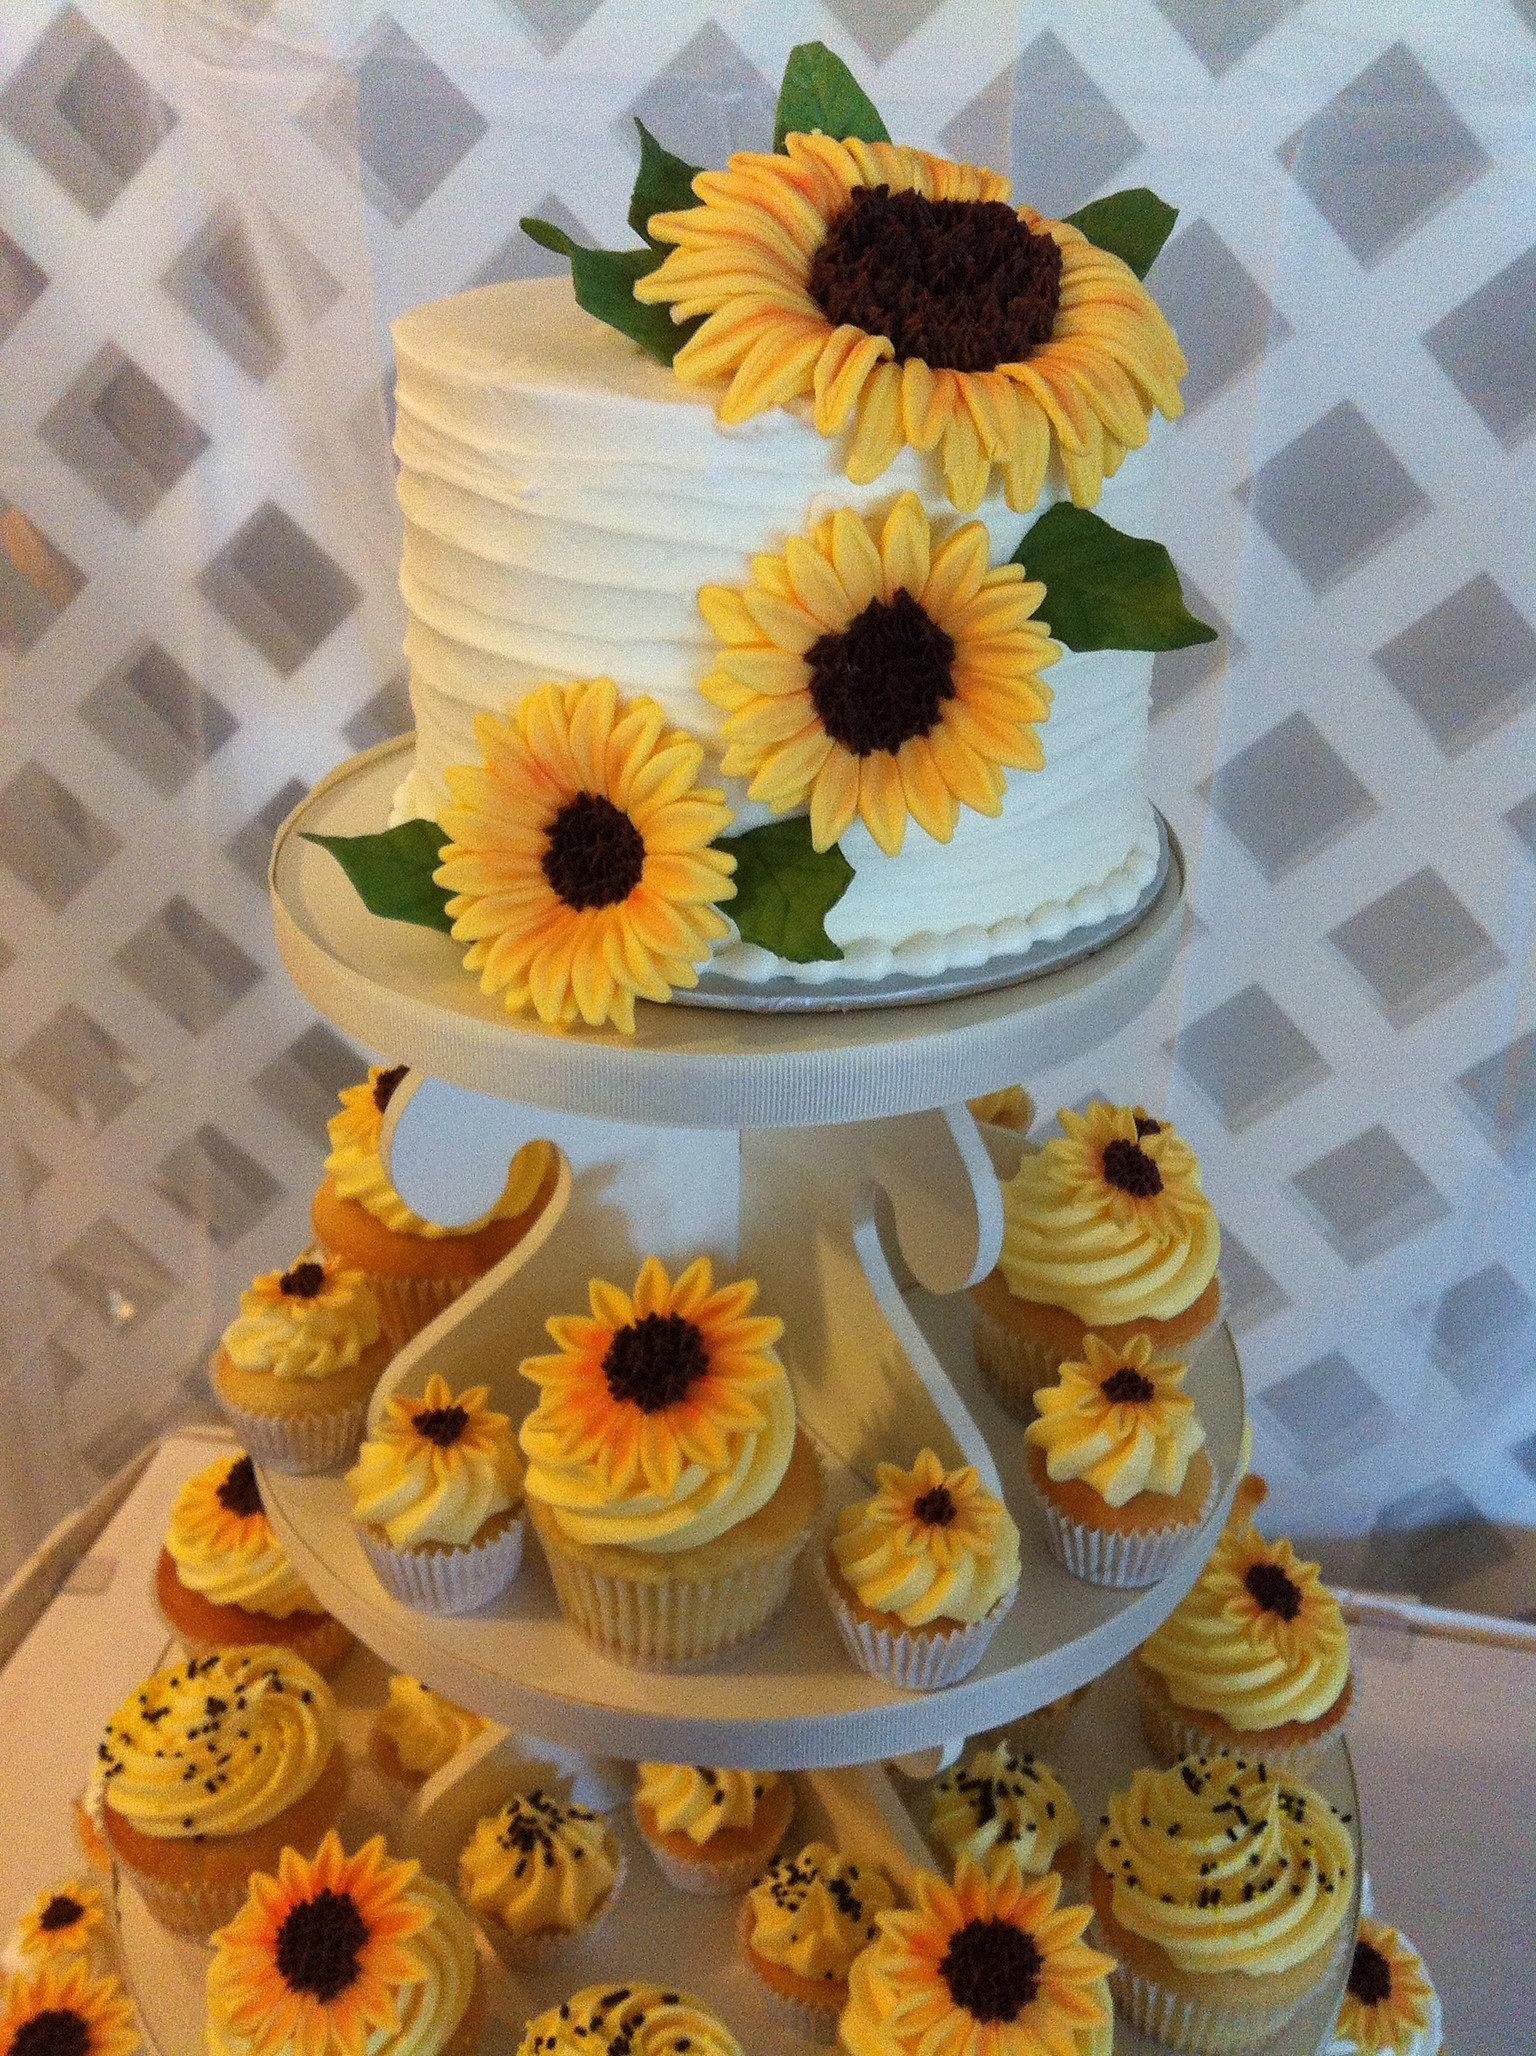 Sunflower cake & cupcakes